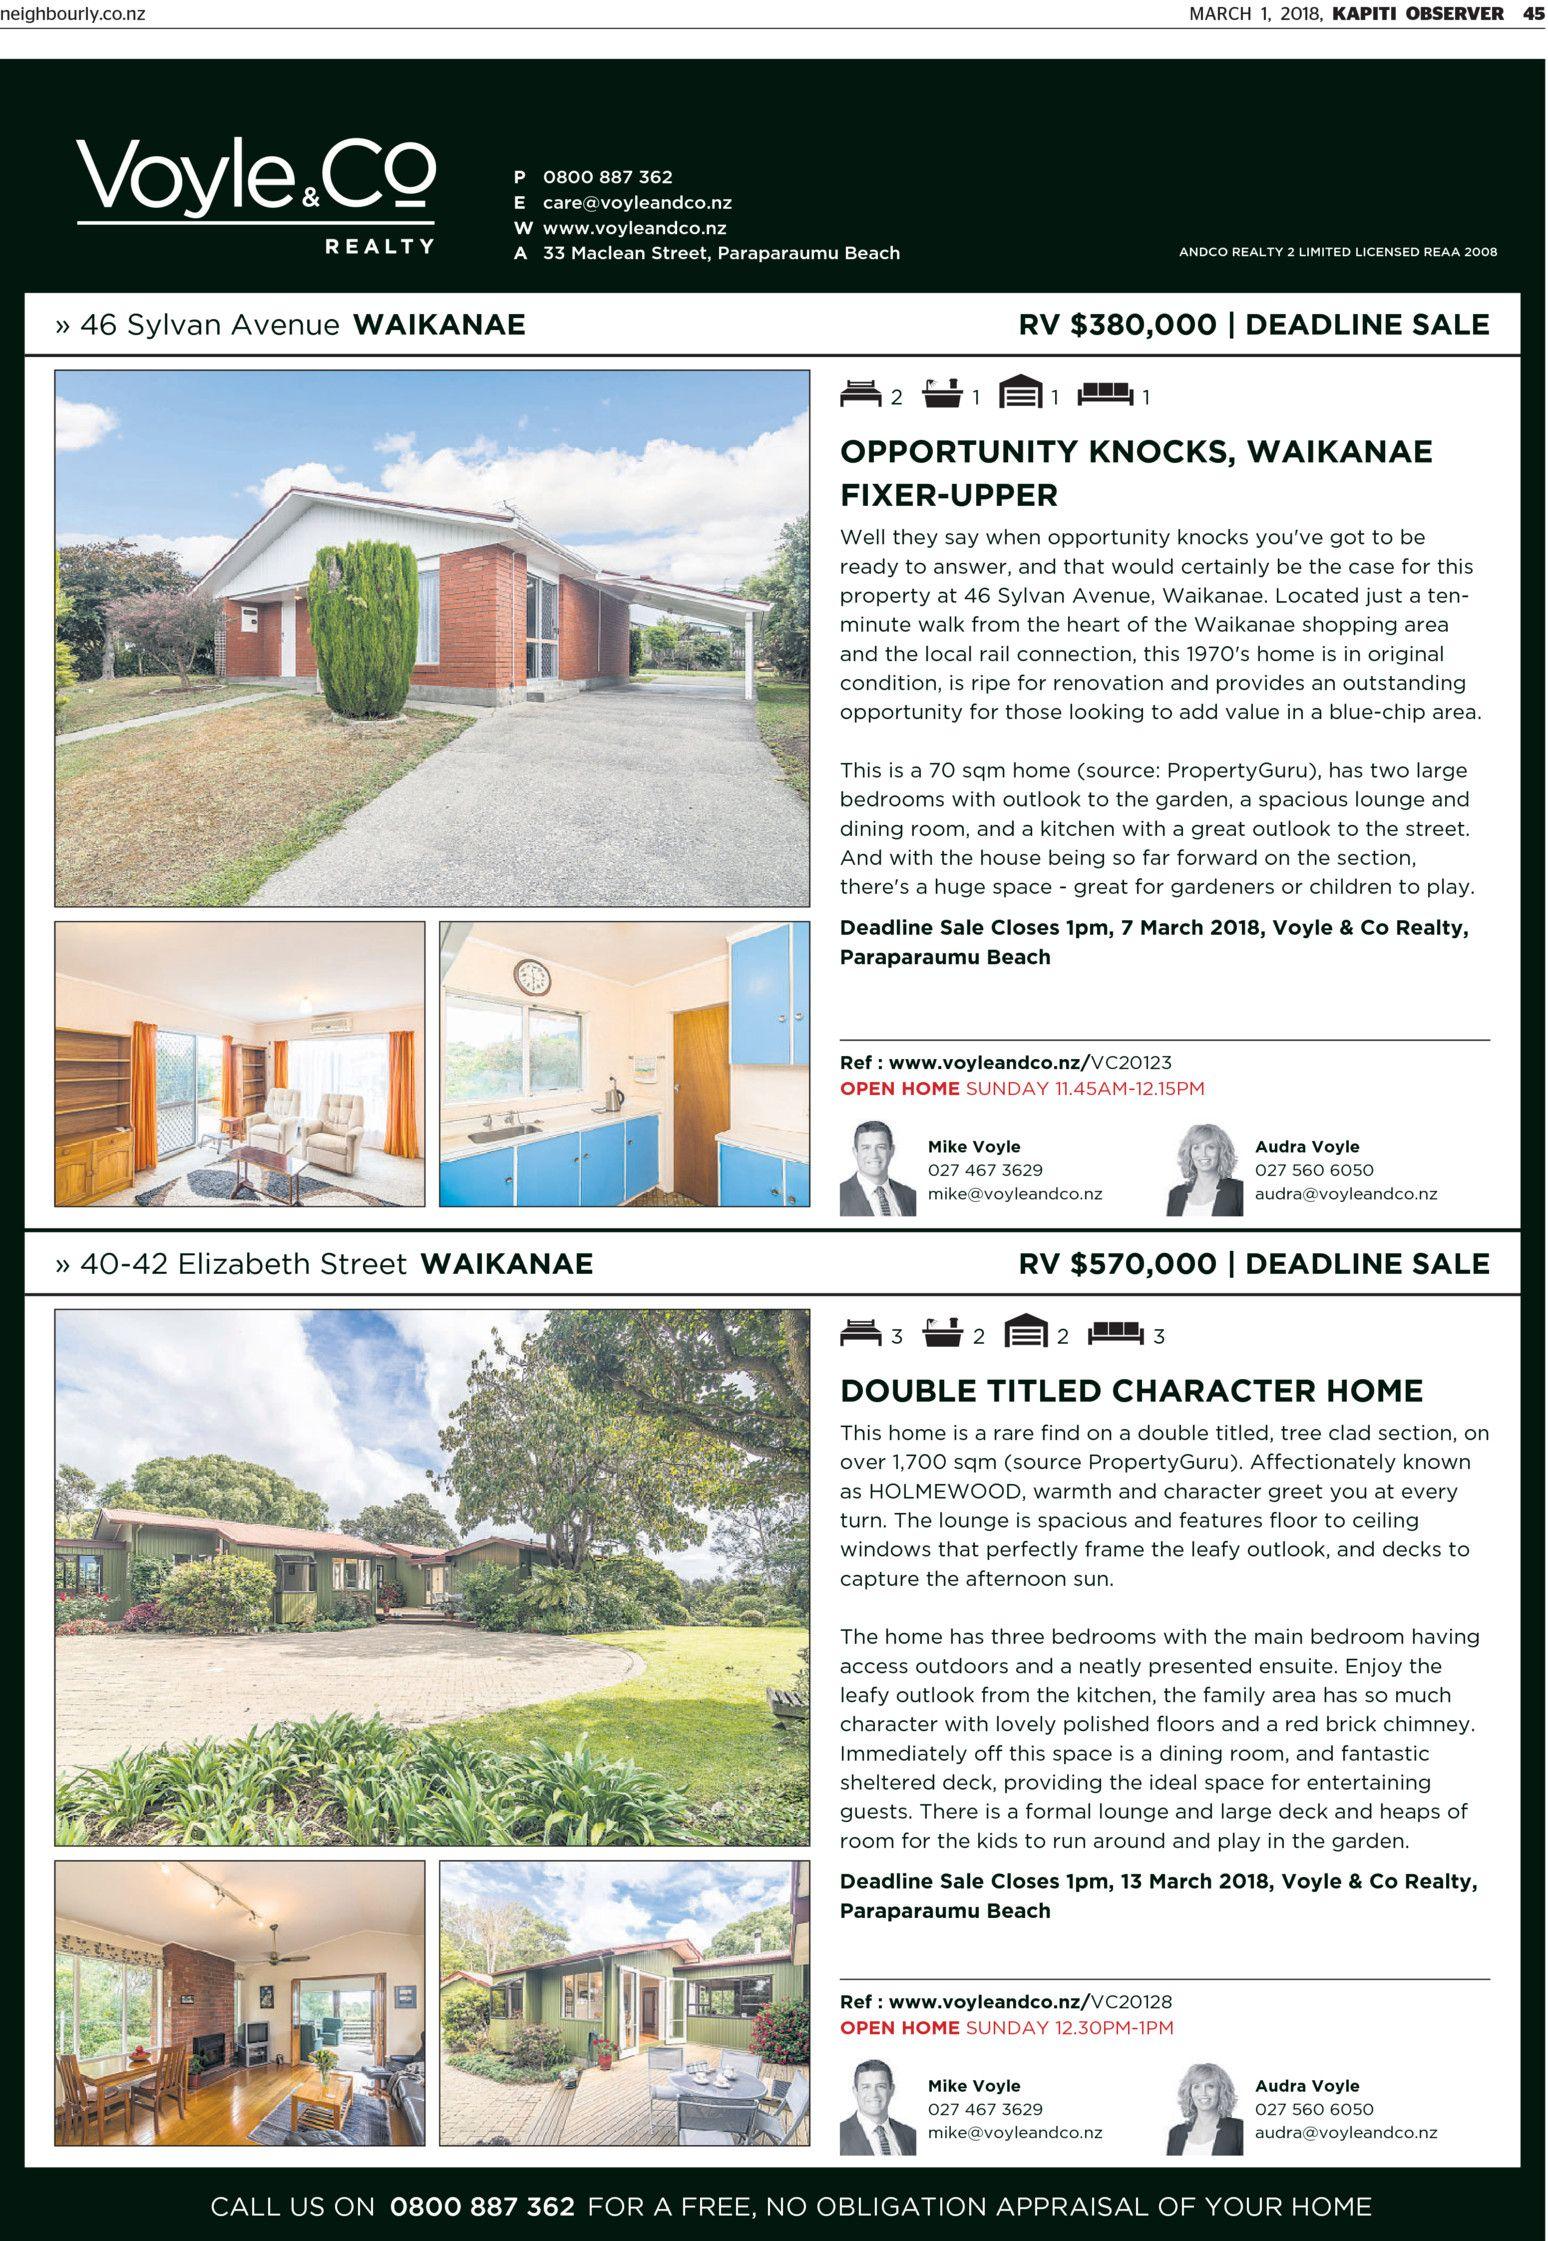 Kāpiti Observer - Read online on Neighbourly